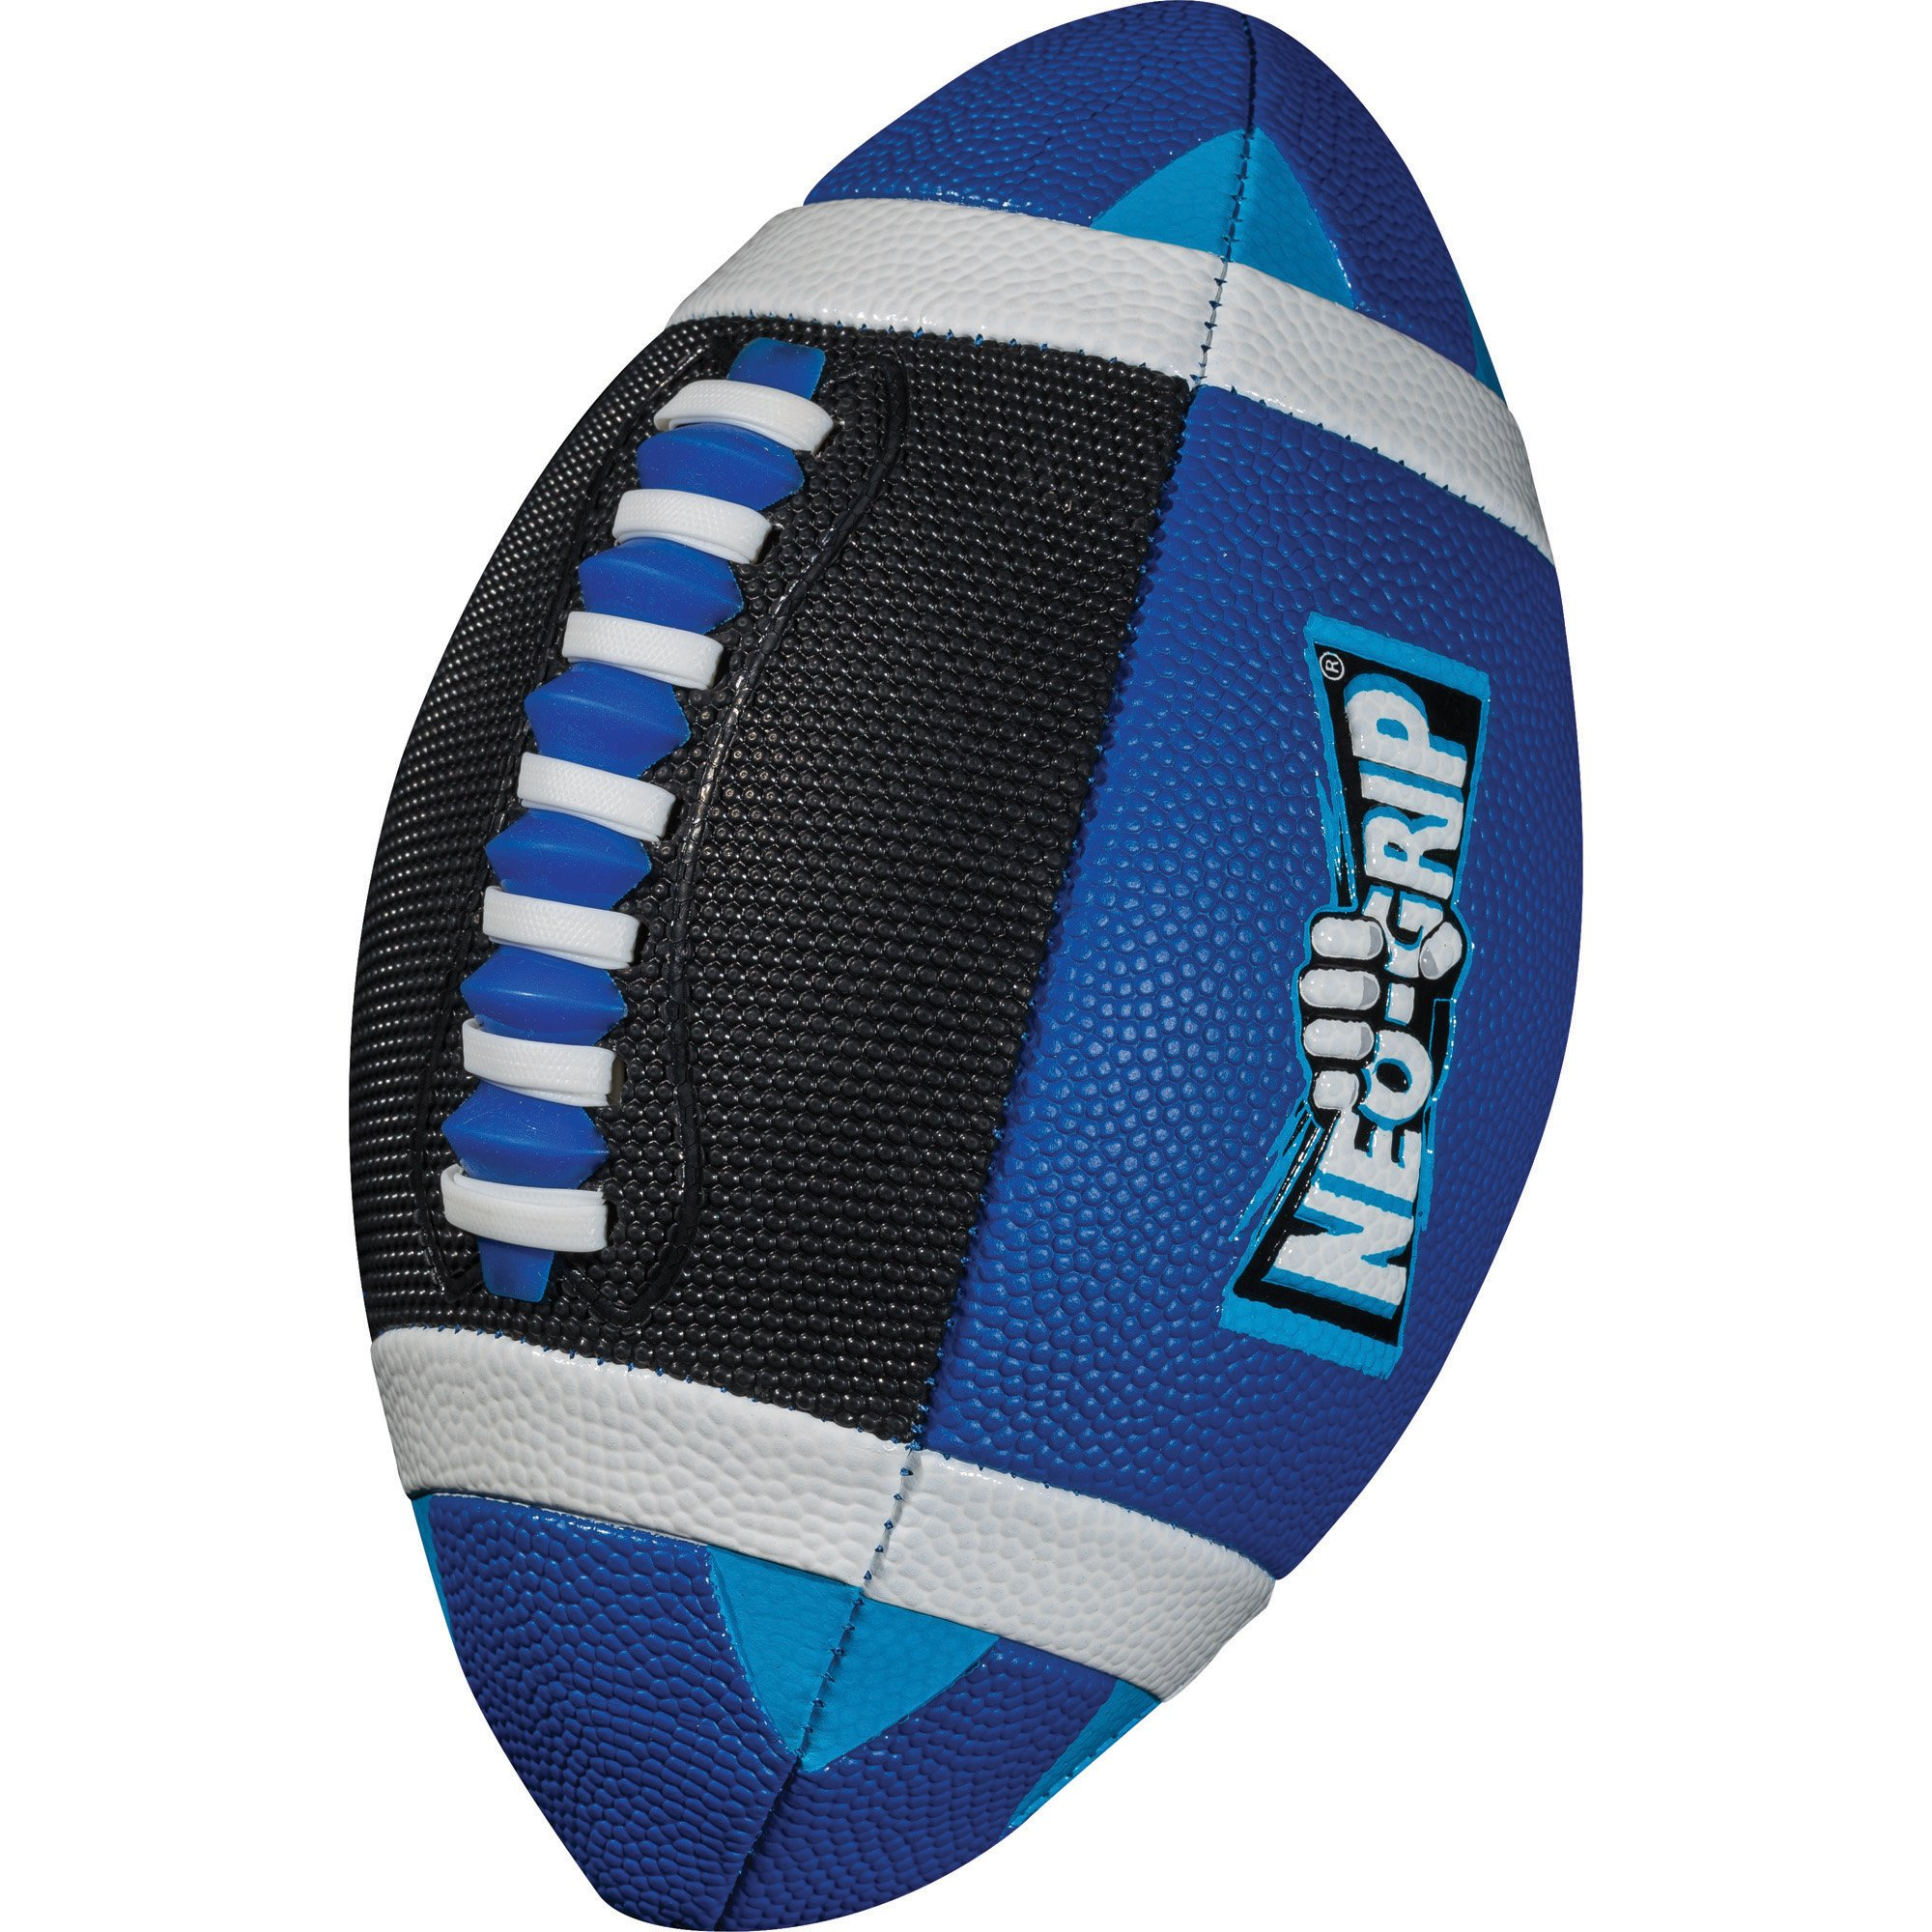 Franklin Sports Grip-Tech Mini Football (Colors May Vary)